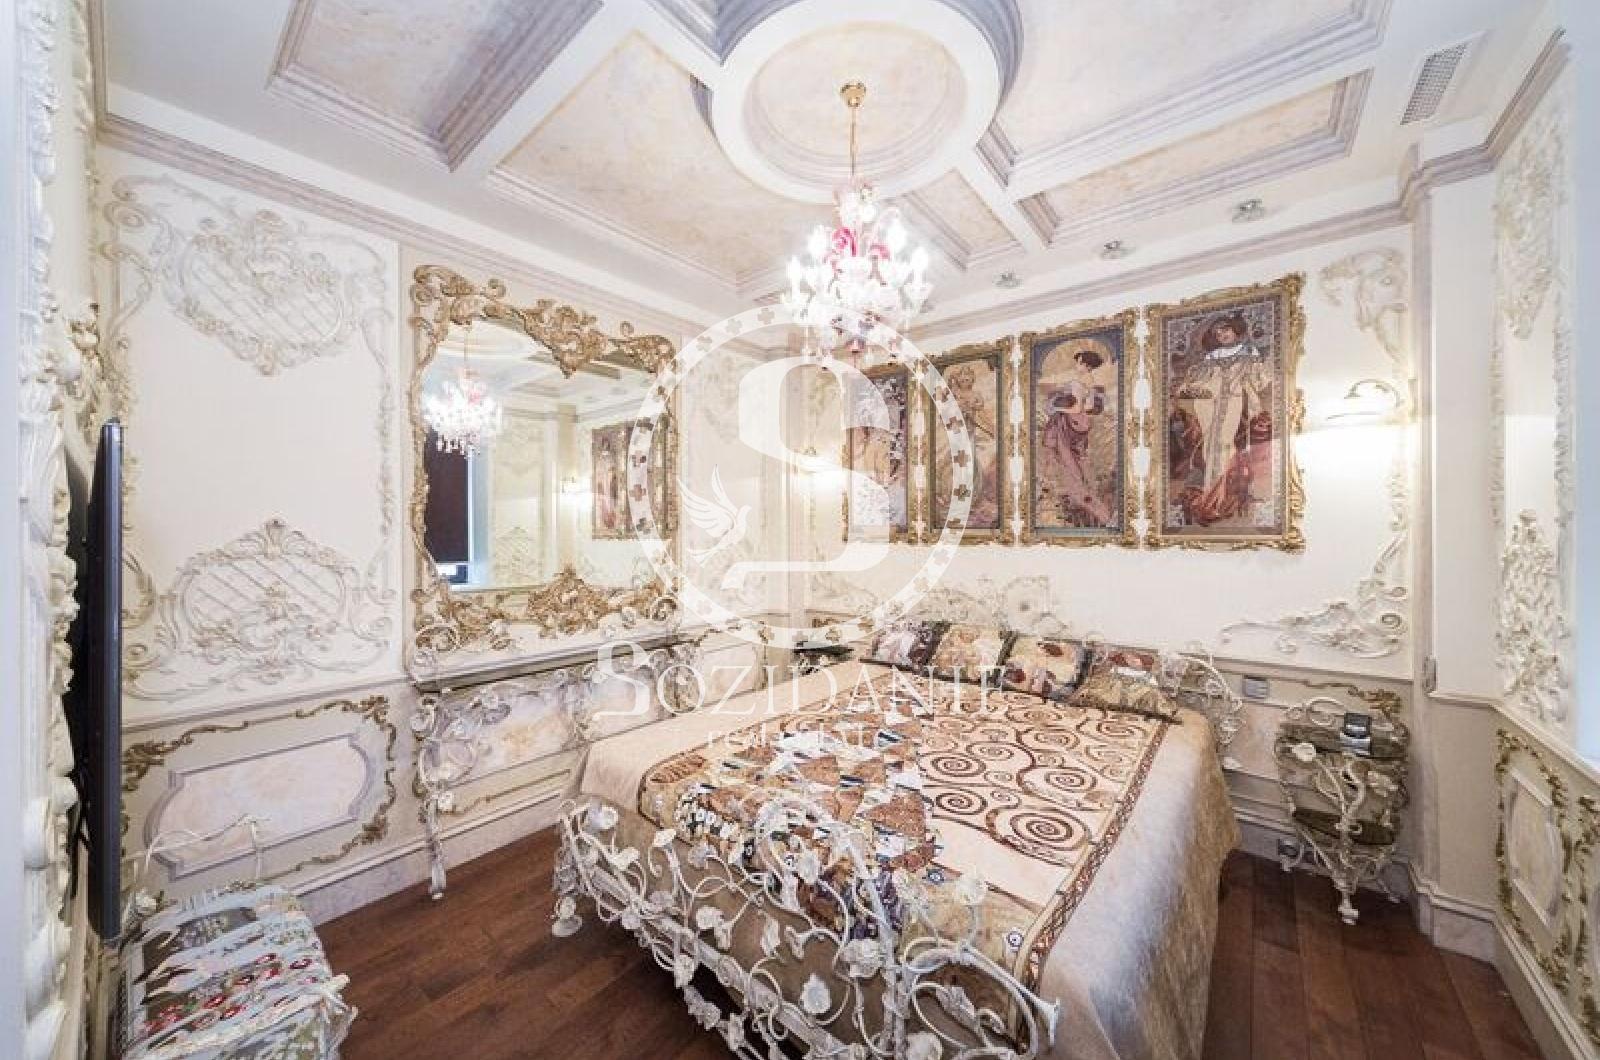 3 Комнаты, Городская, Продажа, Улица Арбат, Listing ID 3441, Москва, Россия,